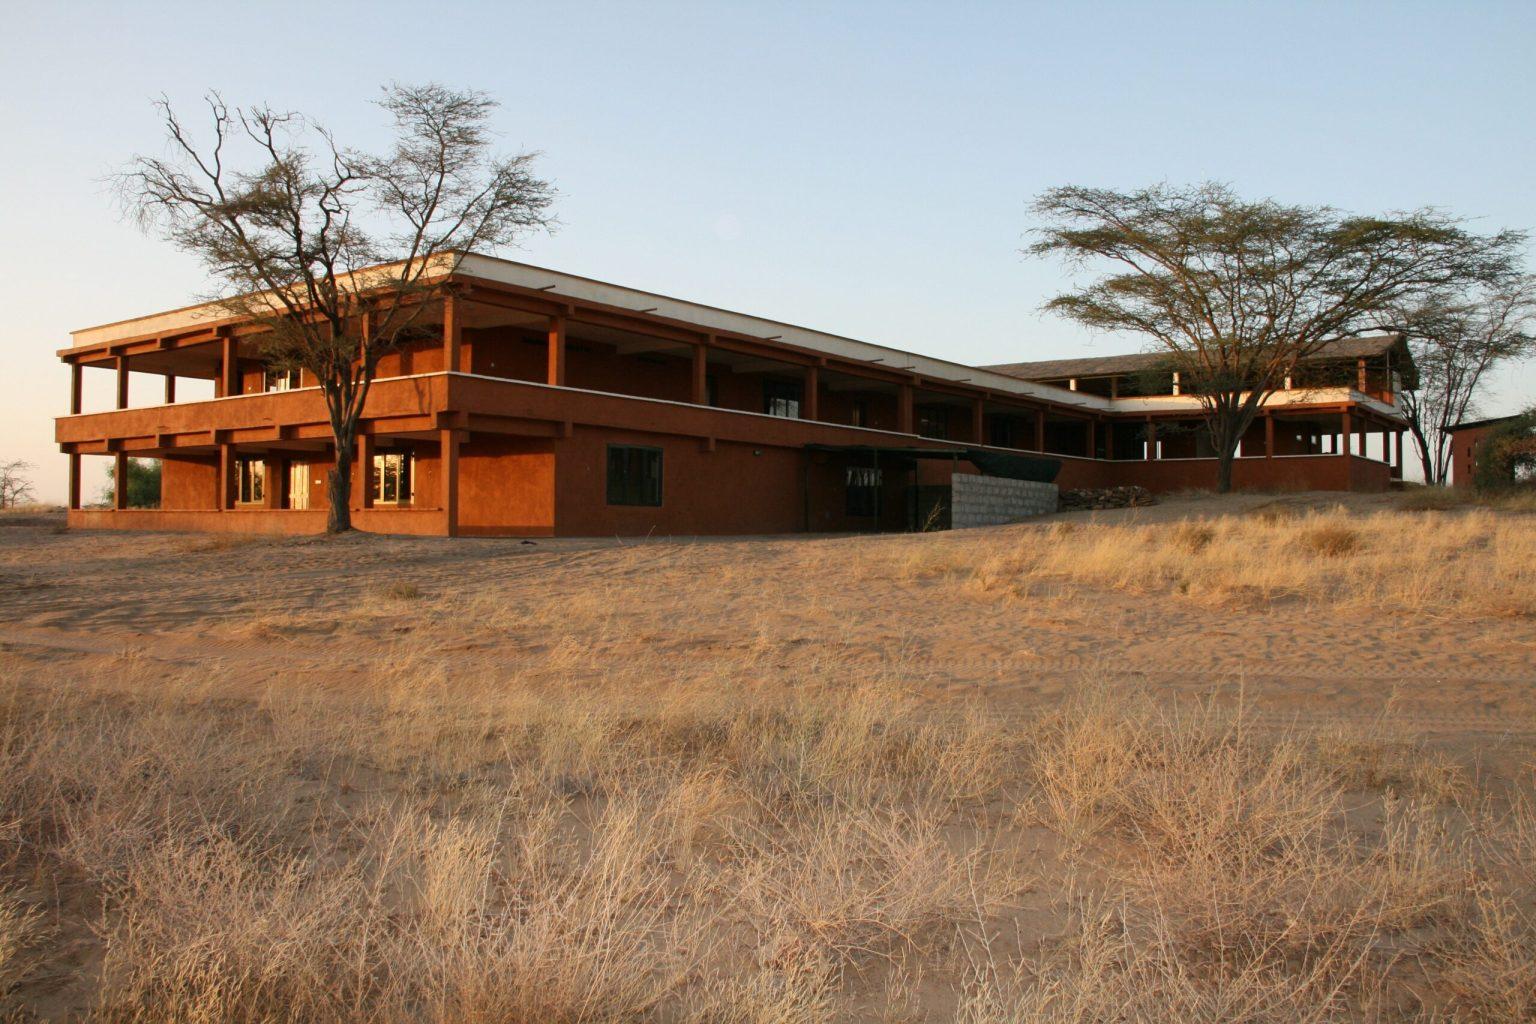 World-renowned Research Facility: Turkana Basin Institute Turkwel in Turkana County, Kenya